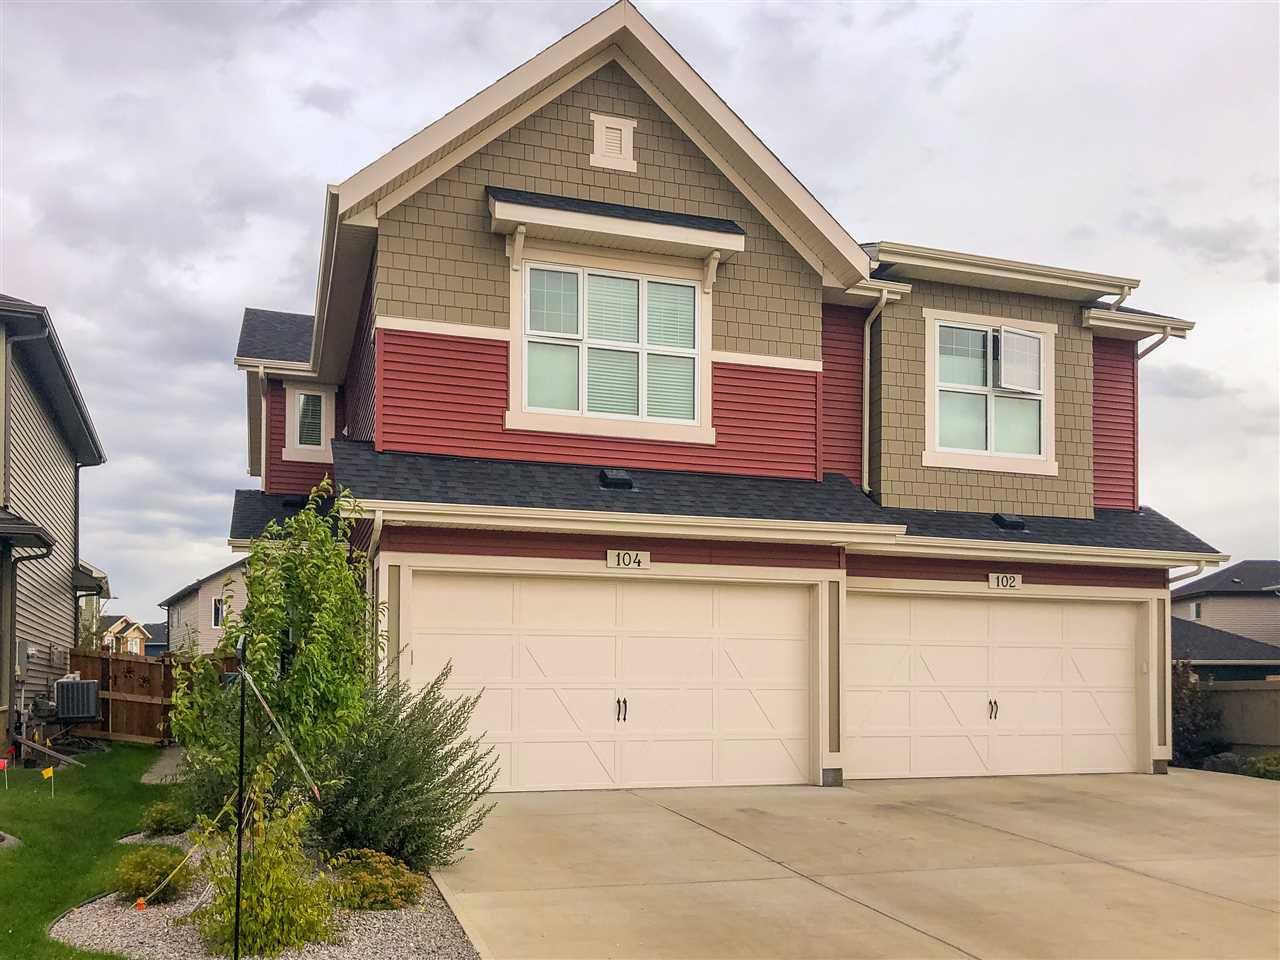 Main Photo: 104 AMBERLEY Way: Sherwood Park House Half Duplex for sale : MLS®# E4213385